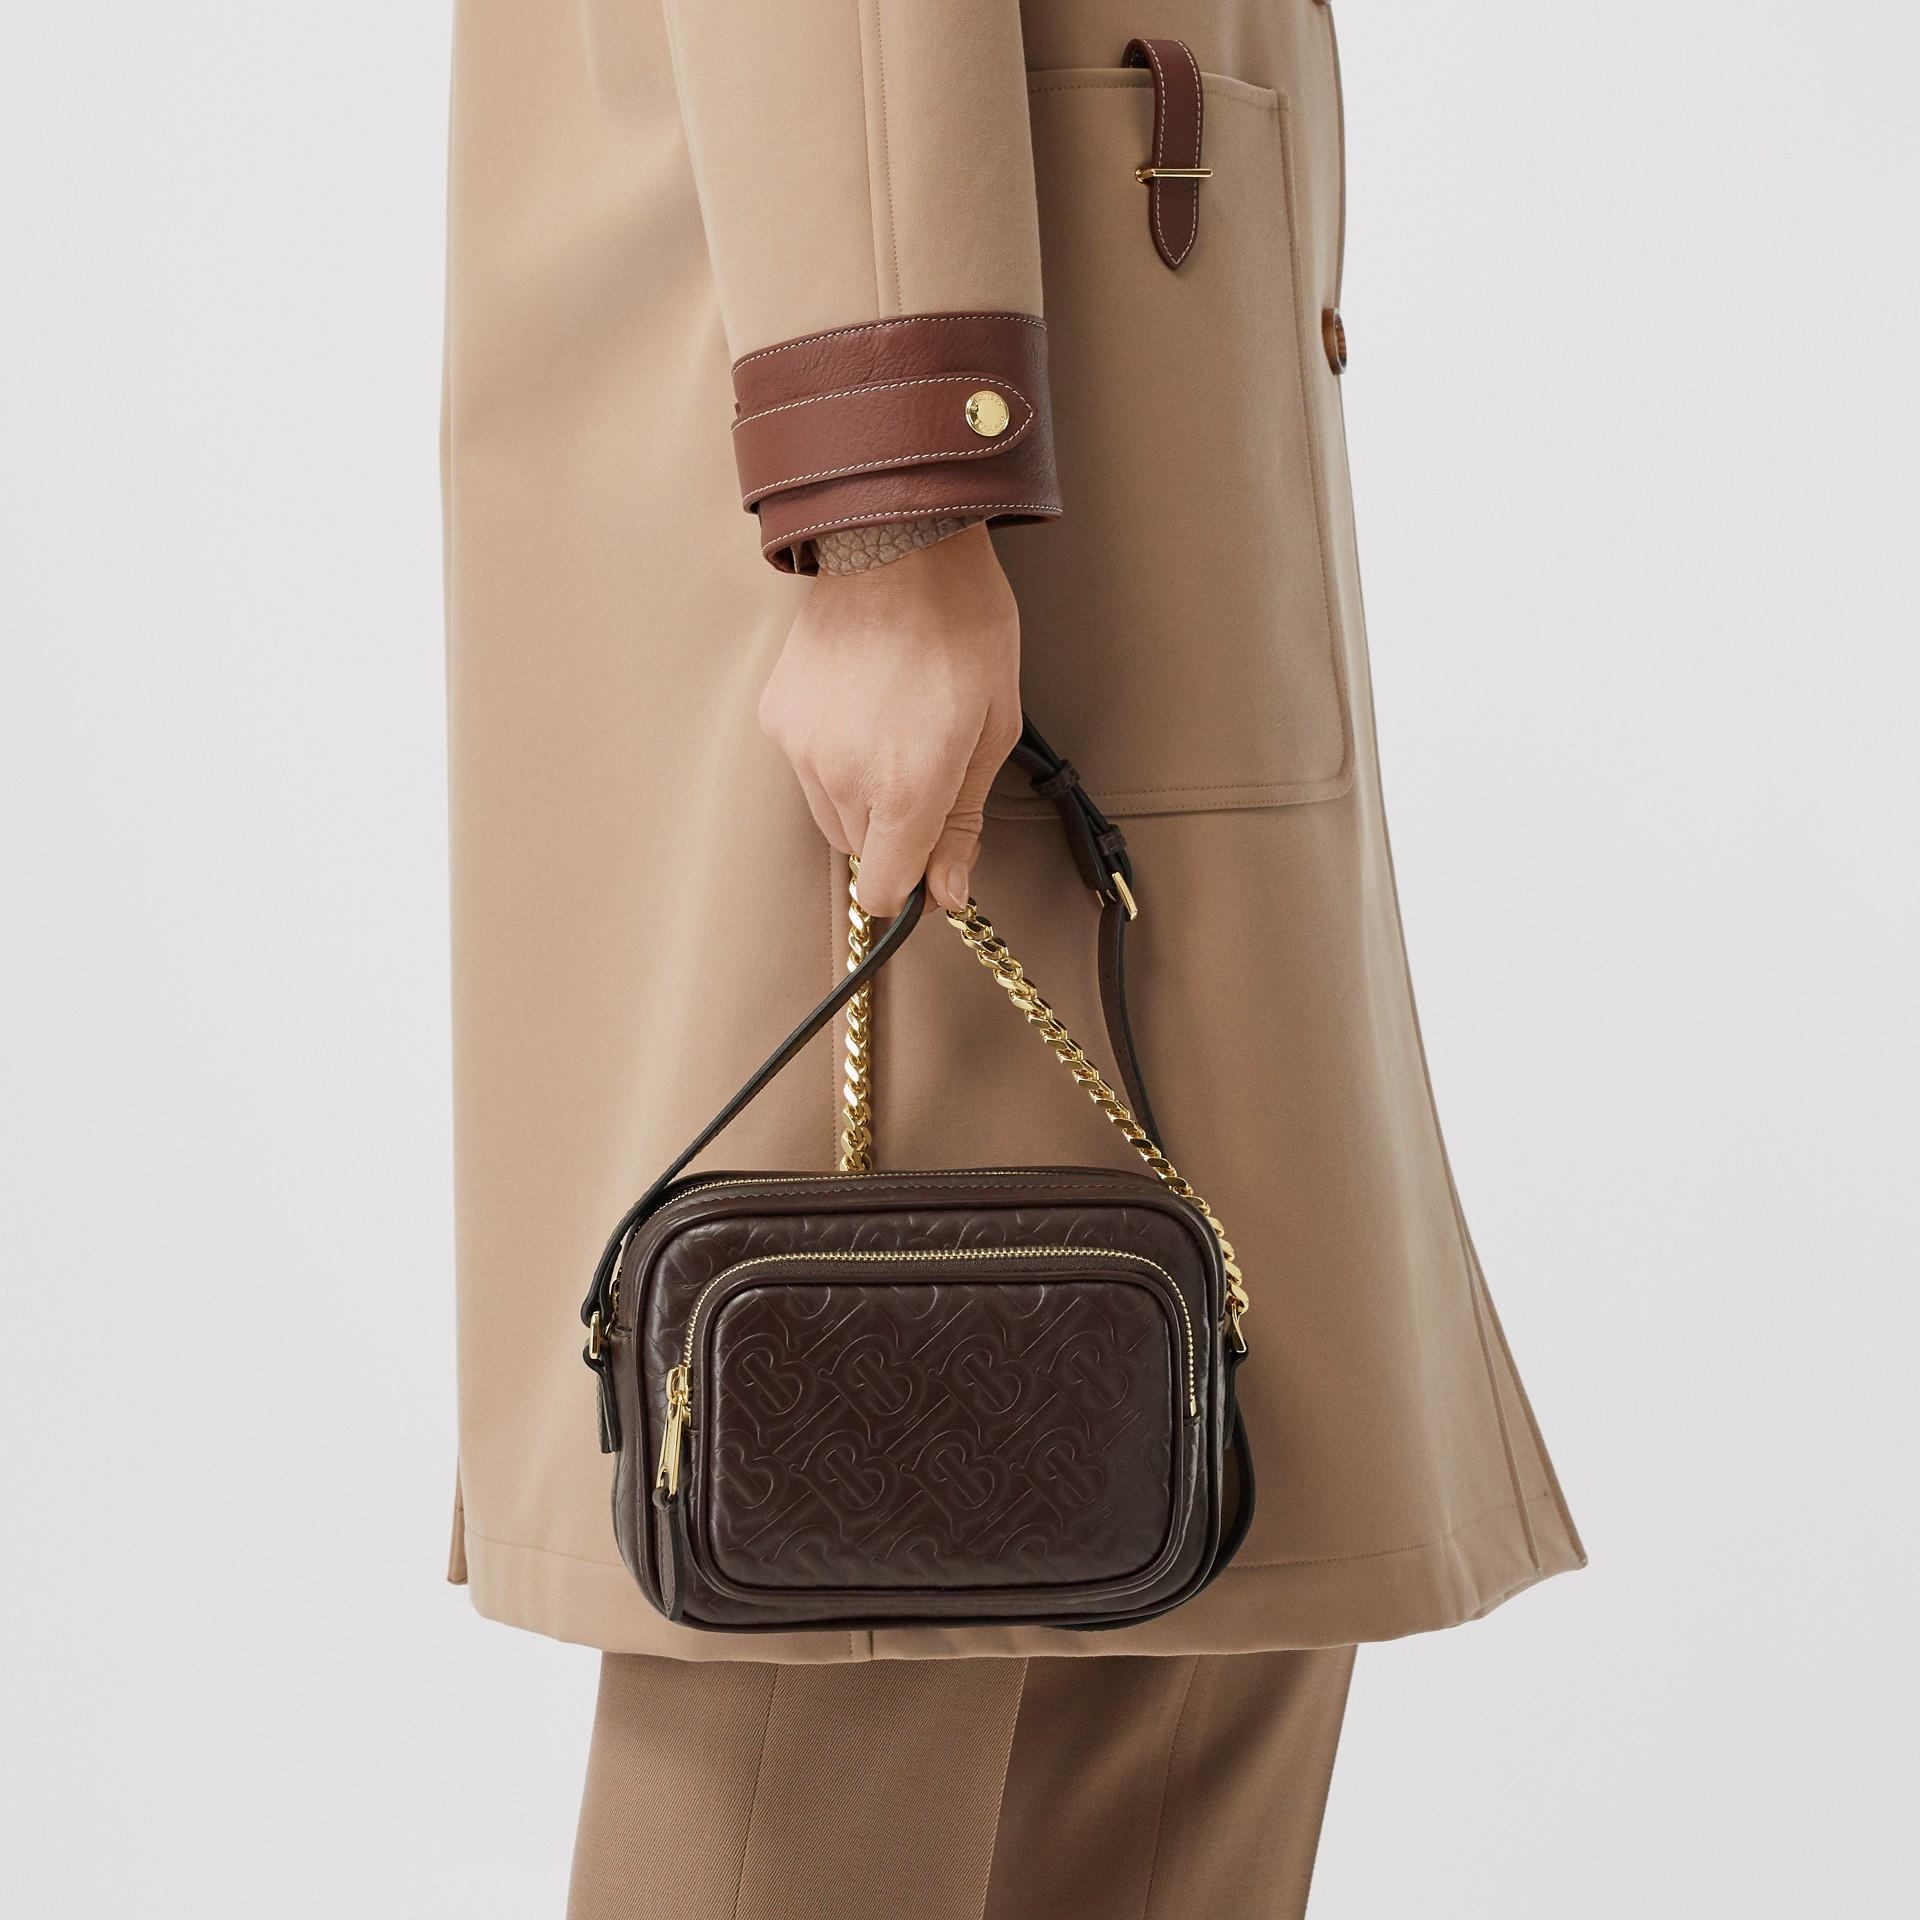 Monogram Leather Camera Bag in Dark Burgundy - Women | Burberry - gallery image 8